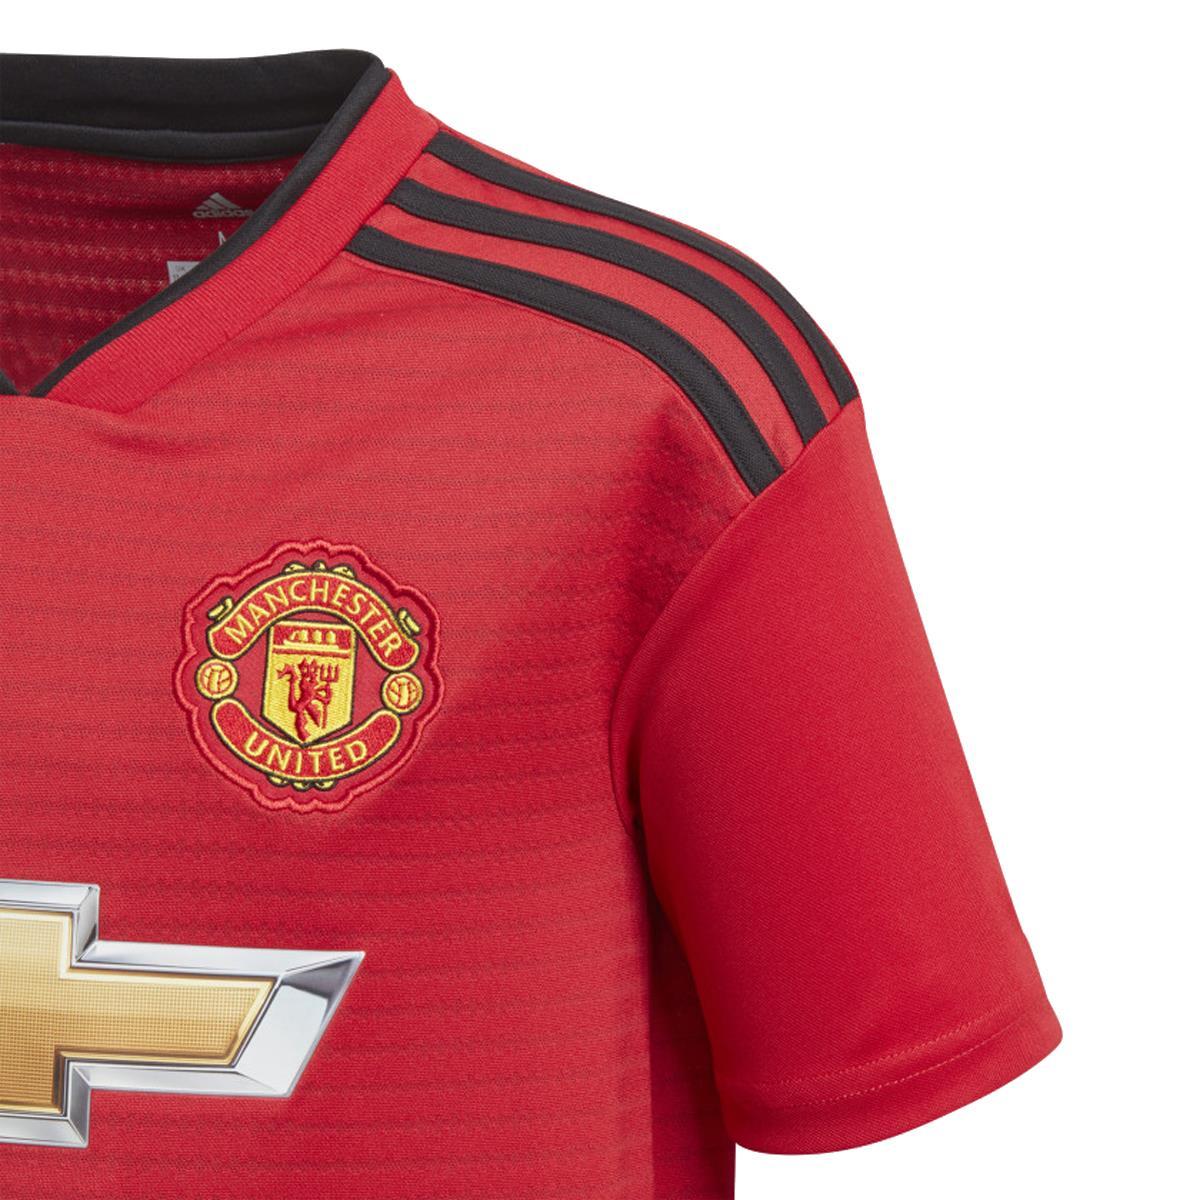 Camisa Adidas Manchester United 2018 Infantil dabce392d3bf3